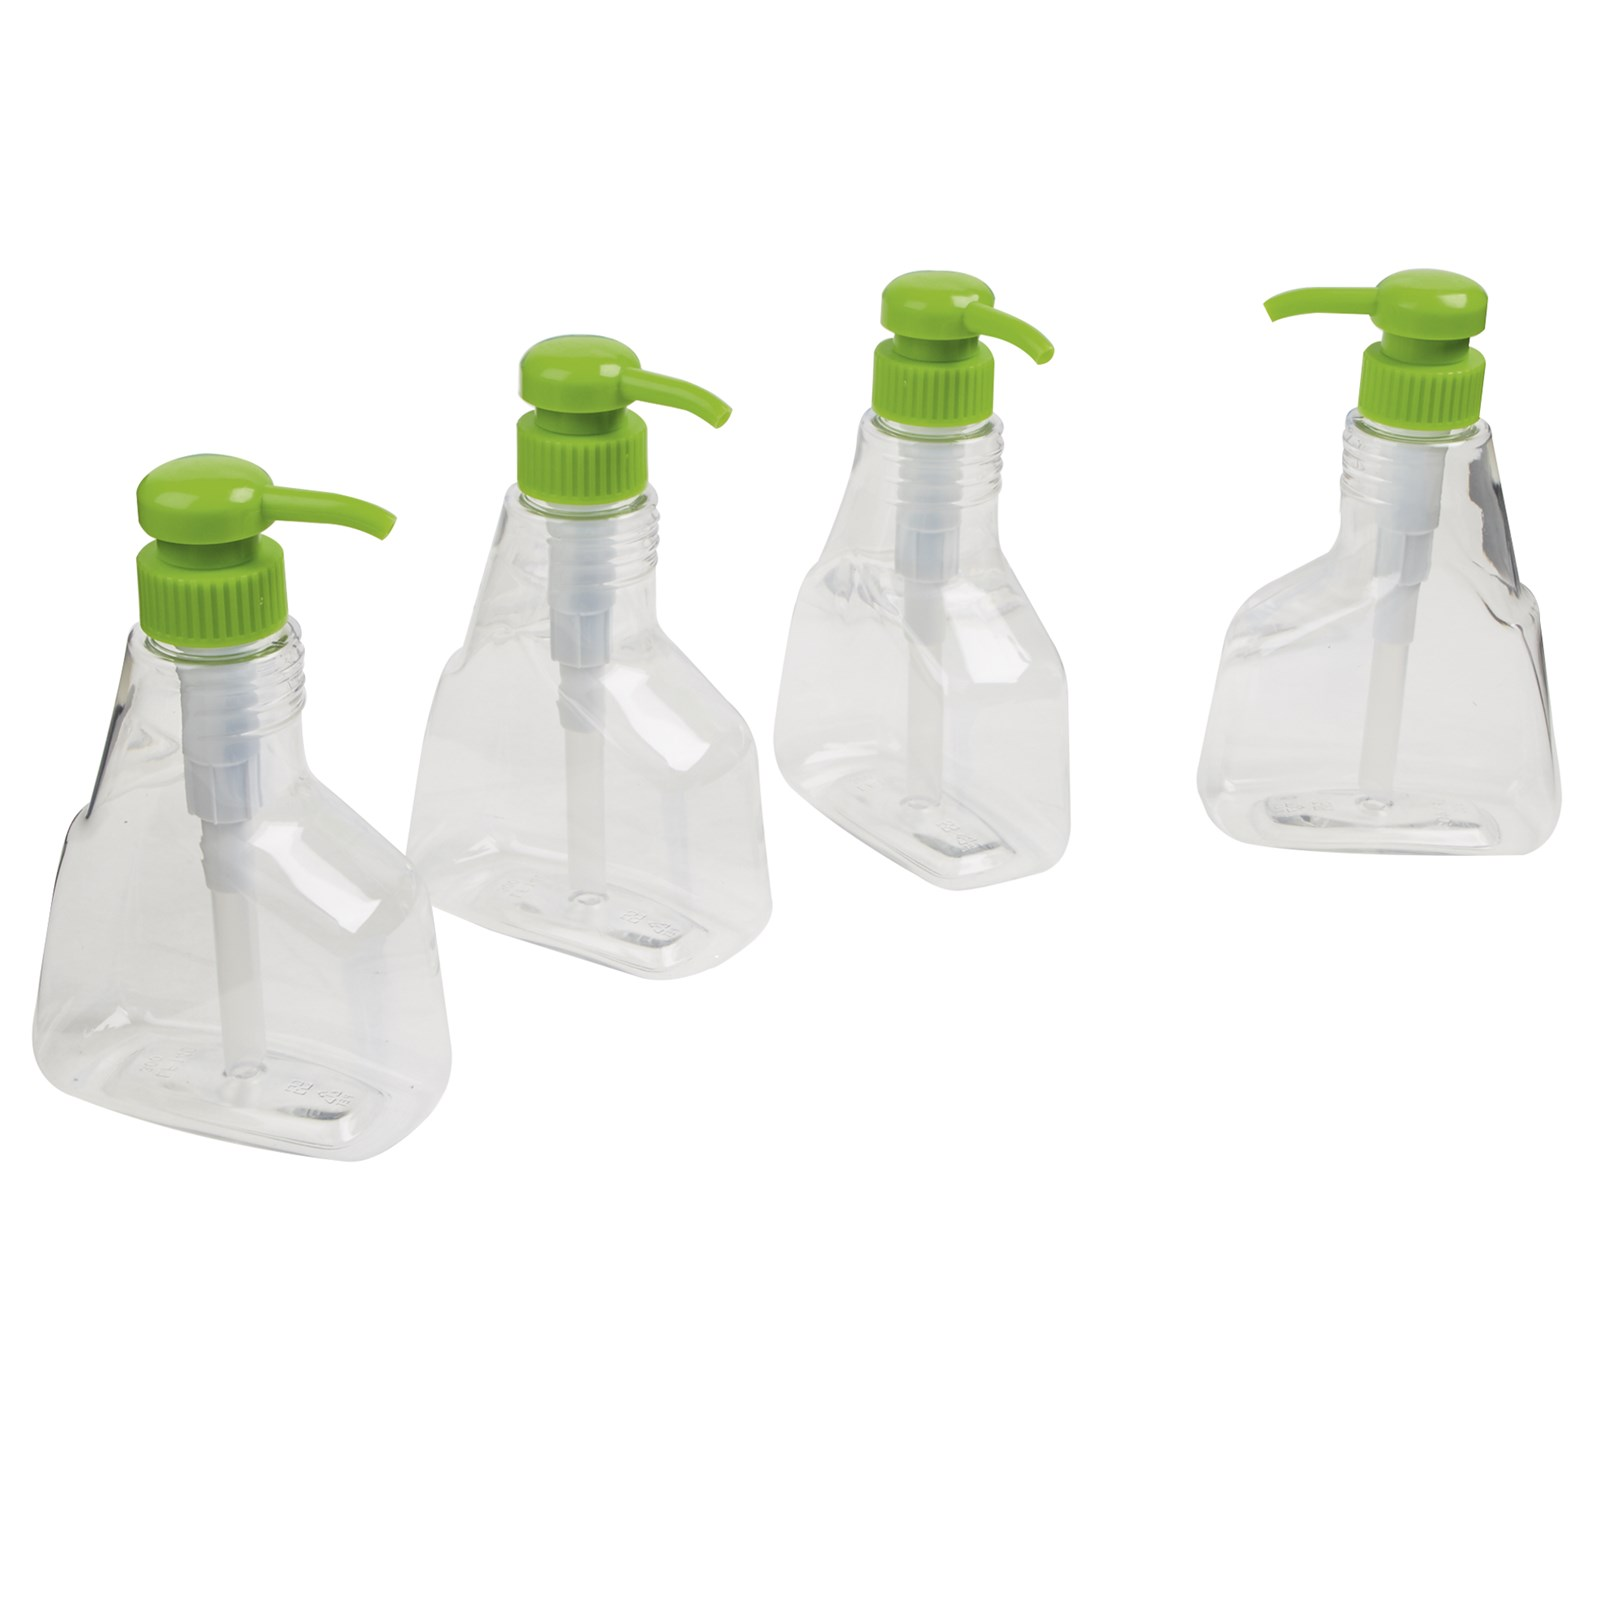 Refillable Pump Bottles 300ml (Pack of 4) CVD19